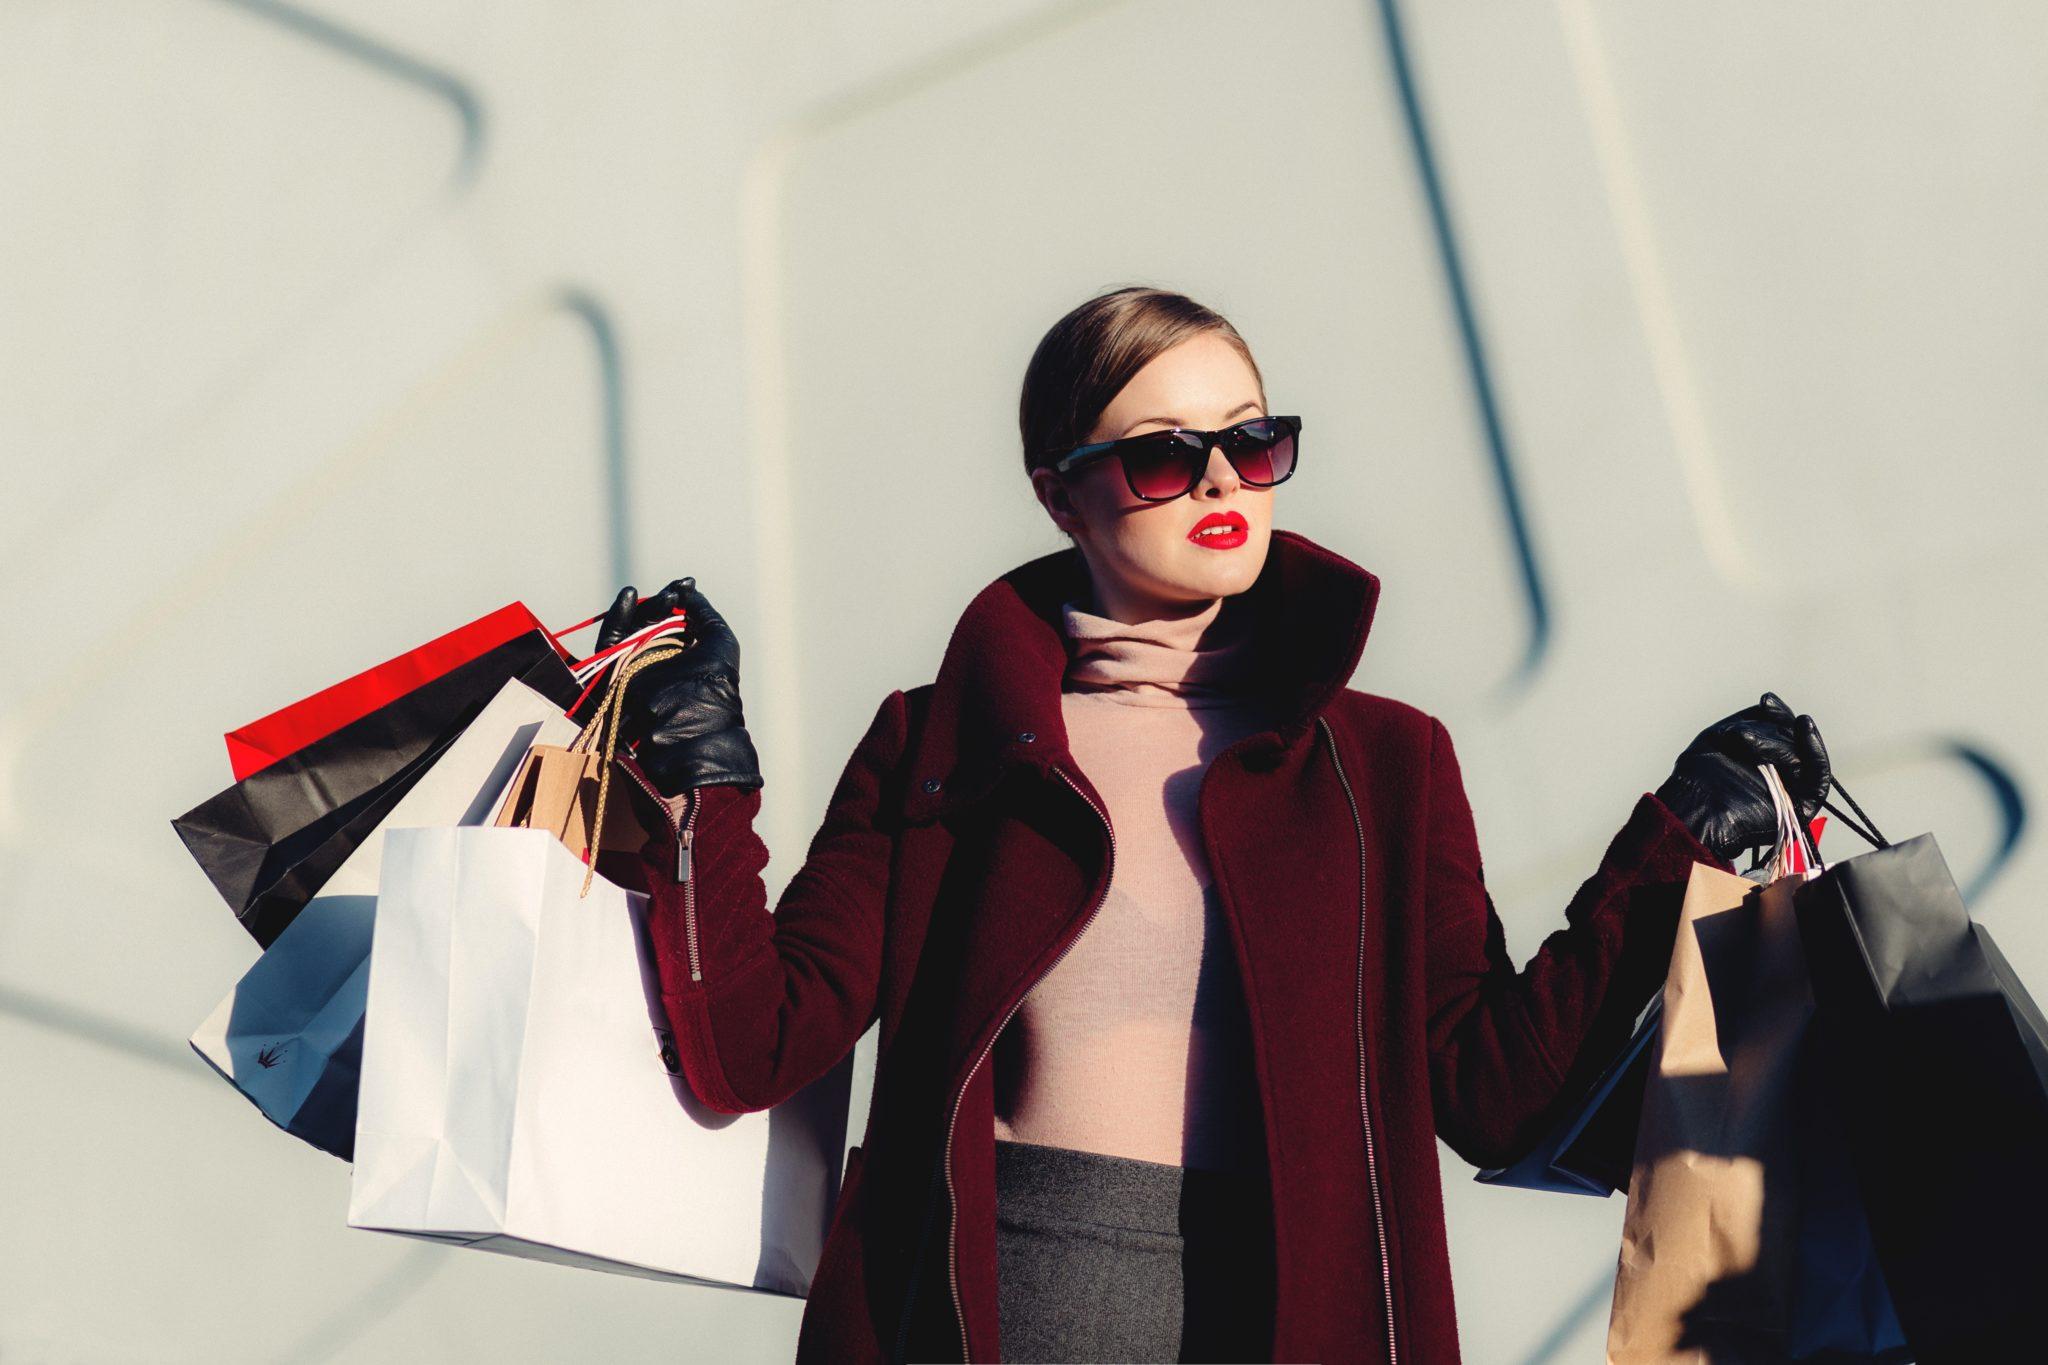 freestocks org 187367 - Accompanied shopping